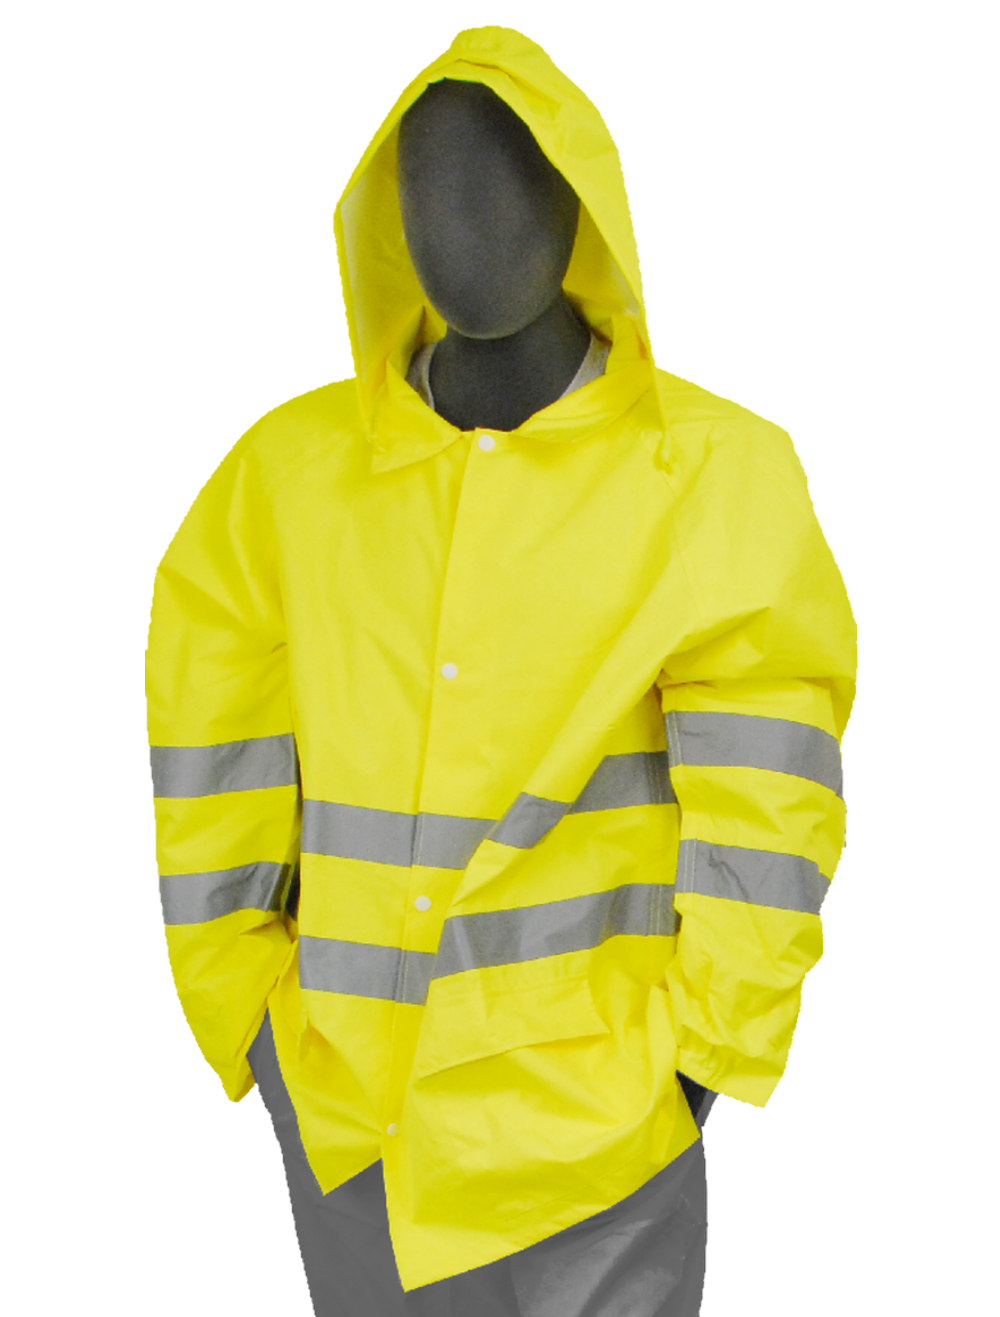 Safety Jacket Majestic 75 1351 Cl3 Hi Vis Yellow Rain Jacket Rain Jacket Yellow Rain Jacket Jackets